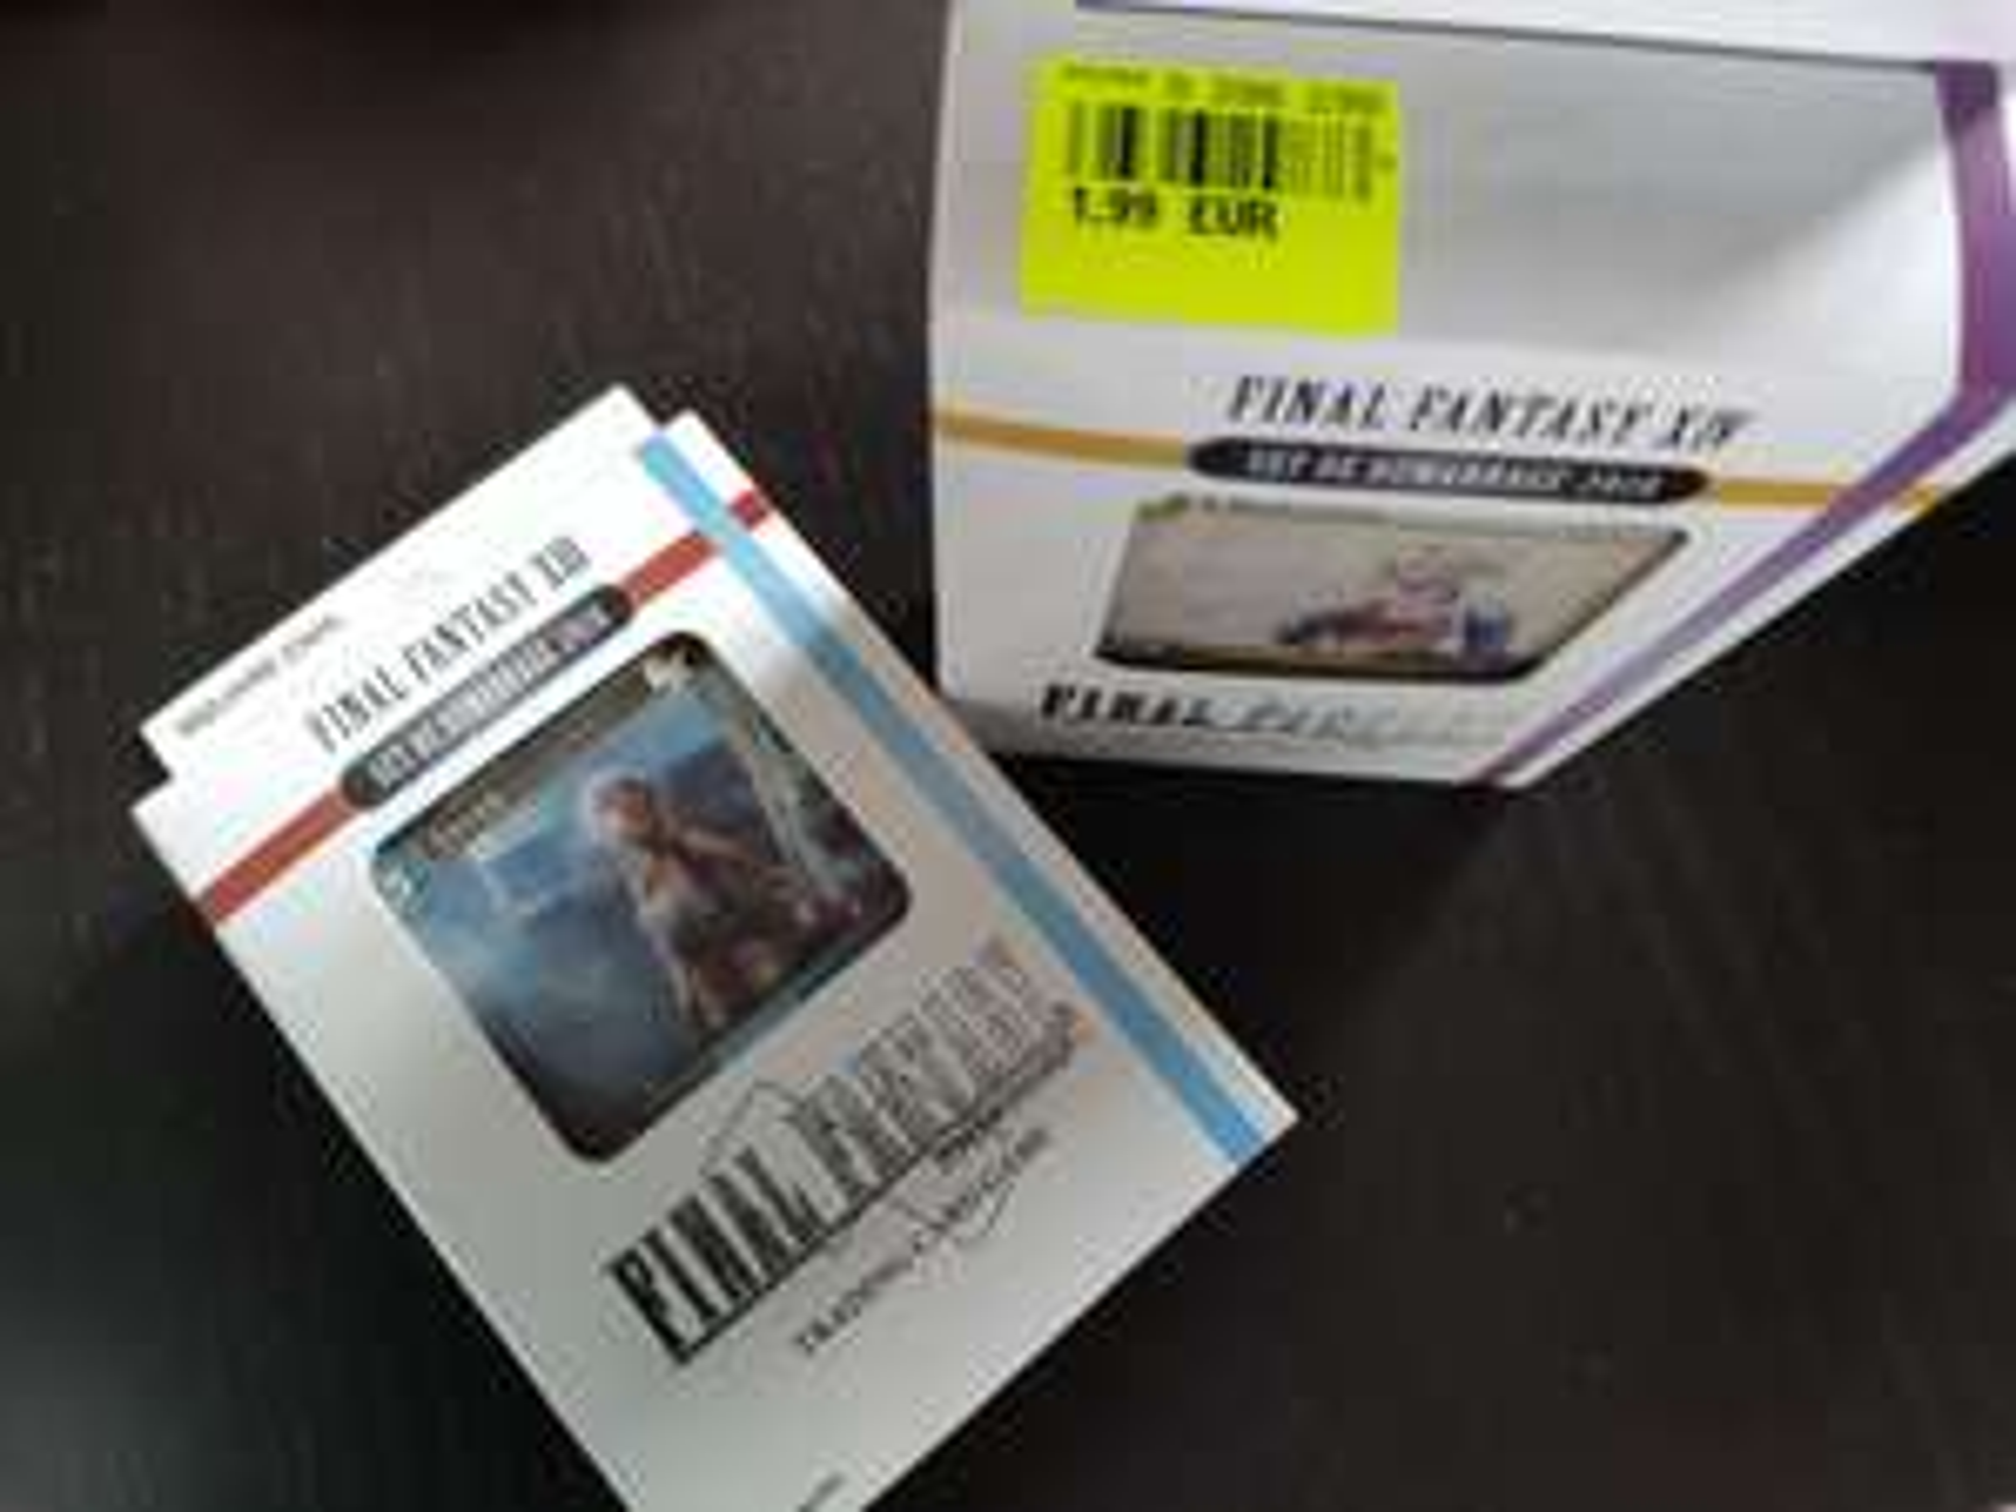 Set de démarrage 2018 Final Fantasy trading card game - Beaune (21)